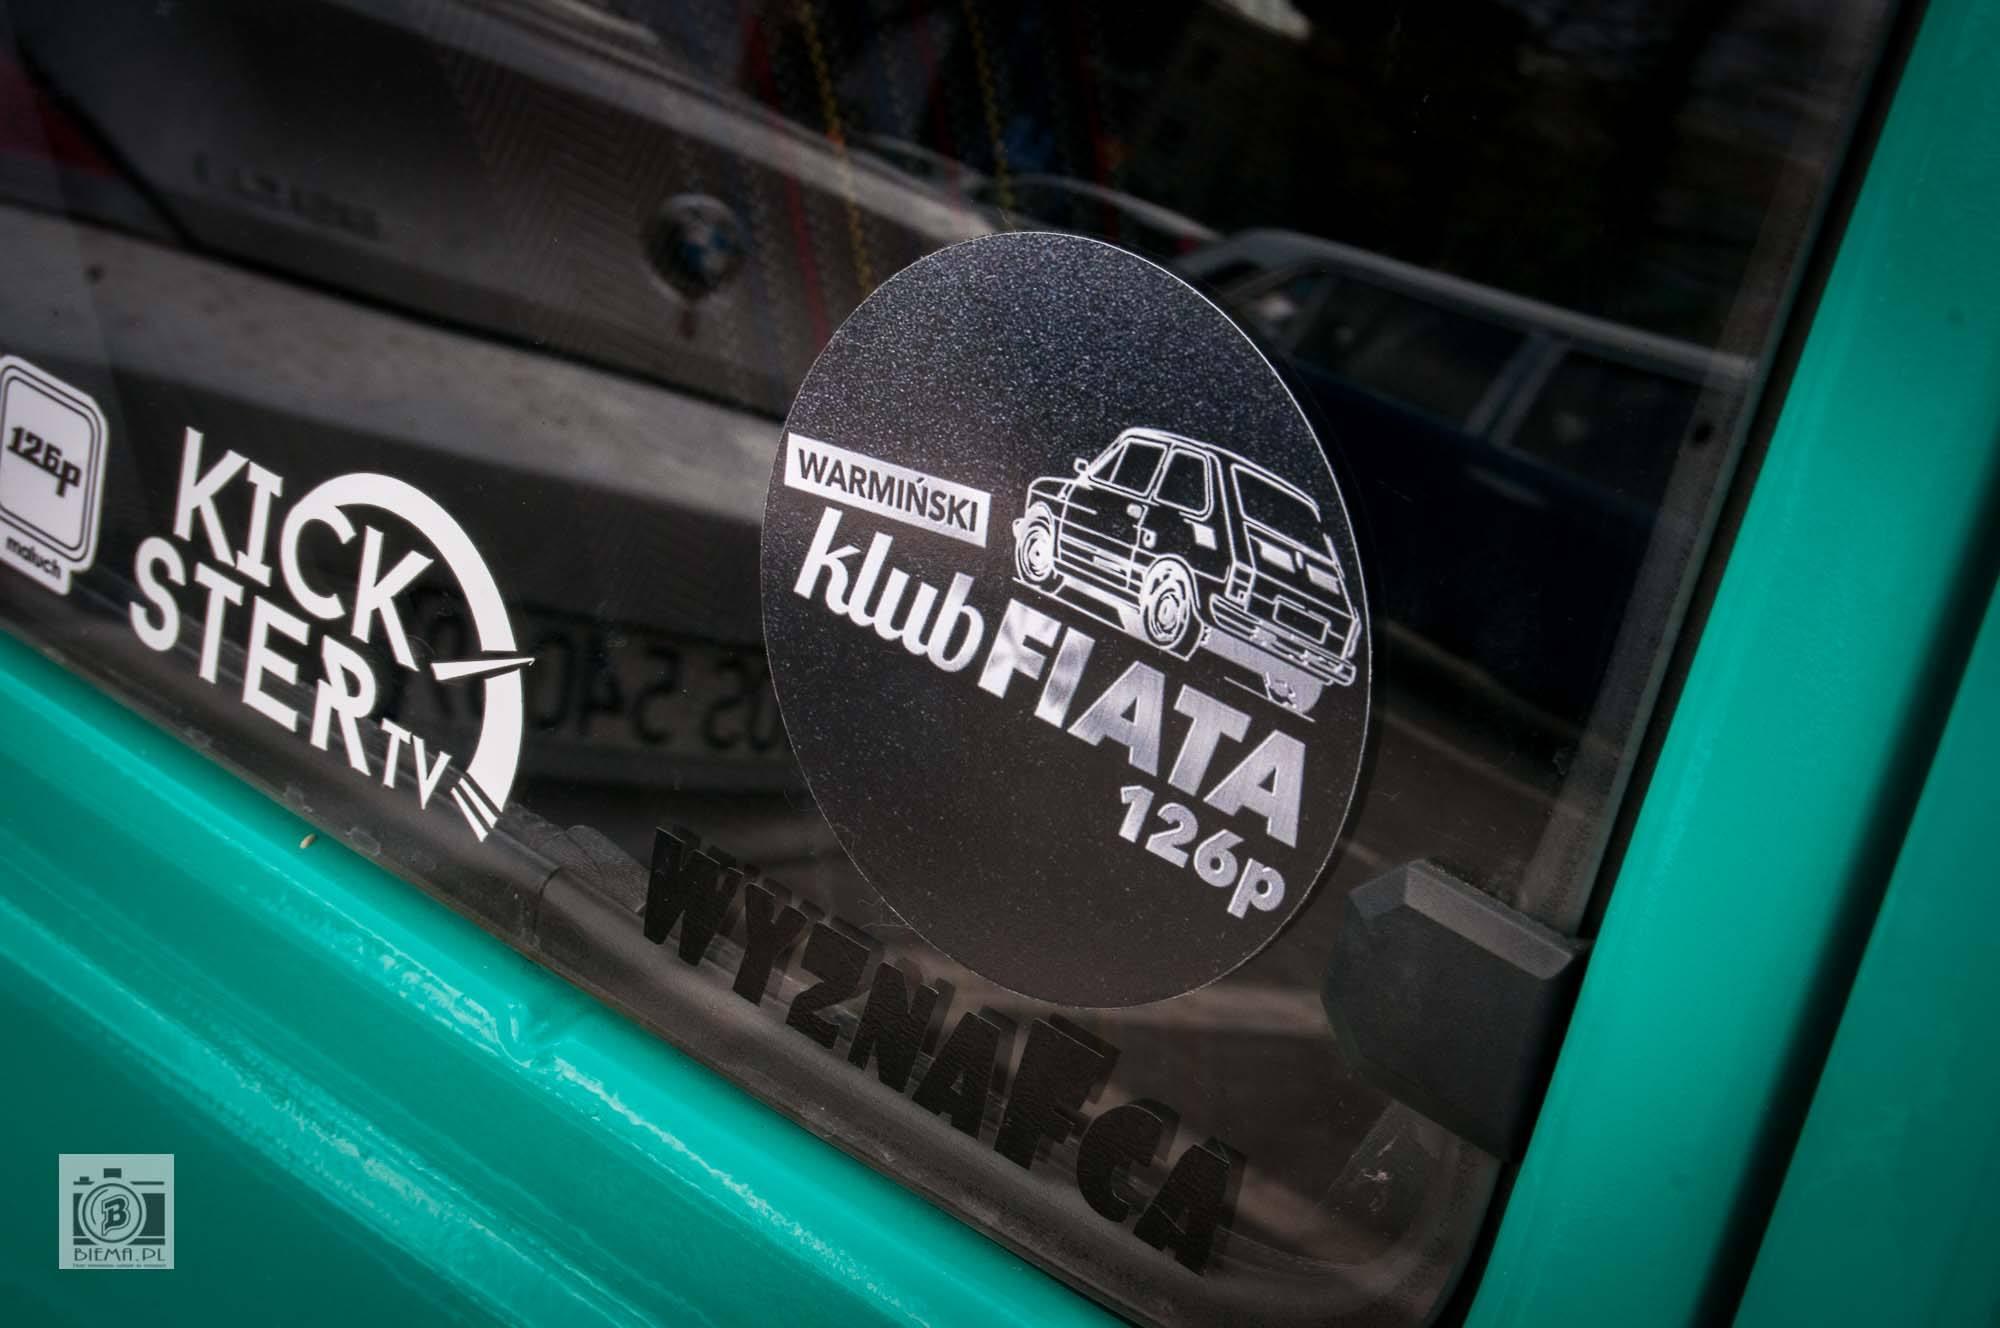 Warmiński Klub Fiata 126p